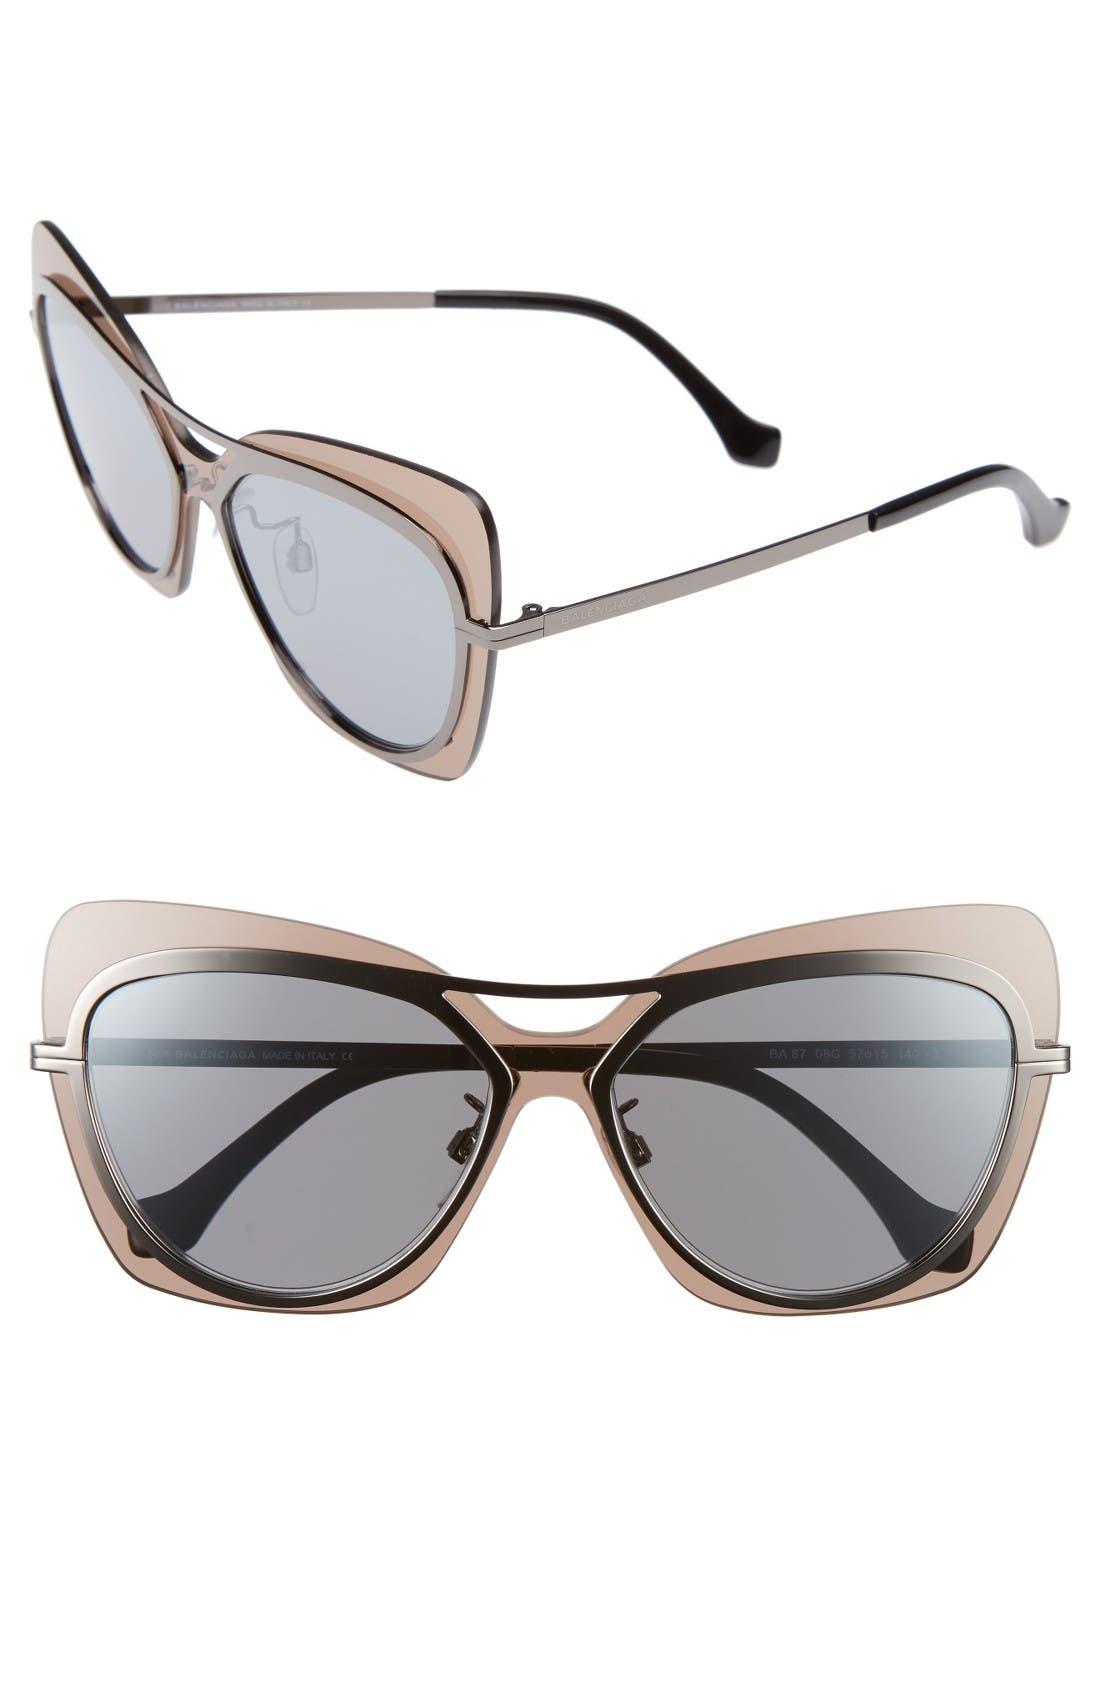 Balenciaga Paris 57mm Layered Butterfly Sunglasses